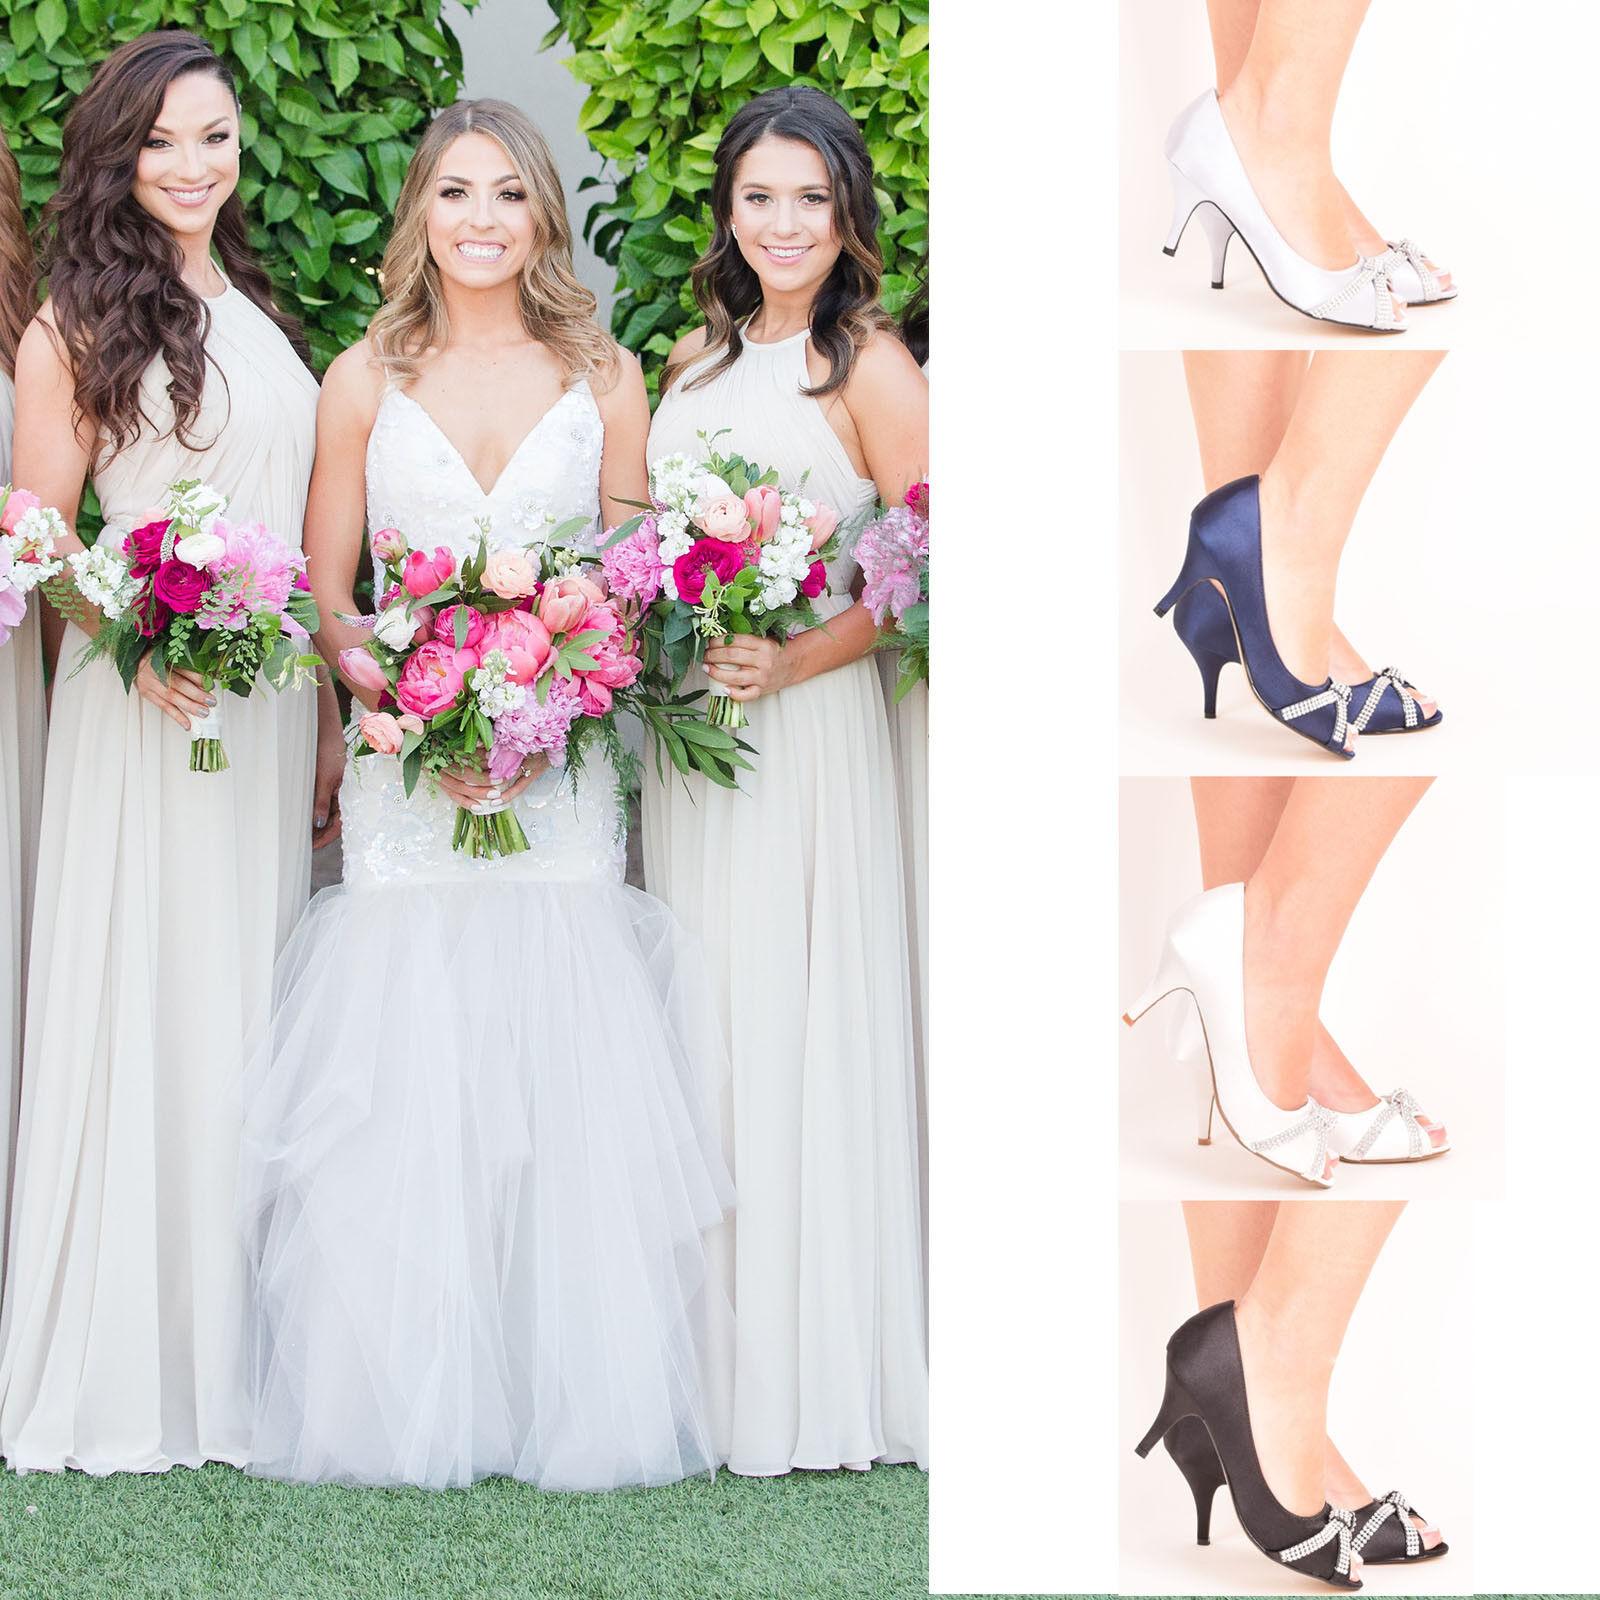 Ladies Women's Bridal Mid Shoes Wedding Bridesmaid Stiletto Low Kitten Mid Bridal Heel Size 53081e